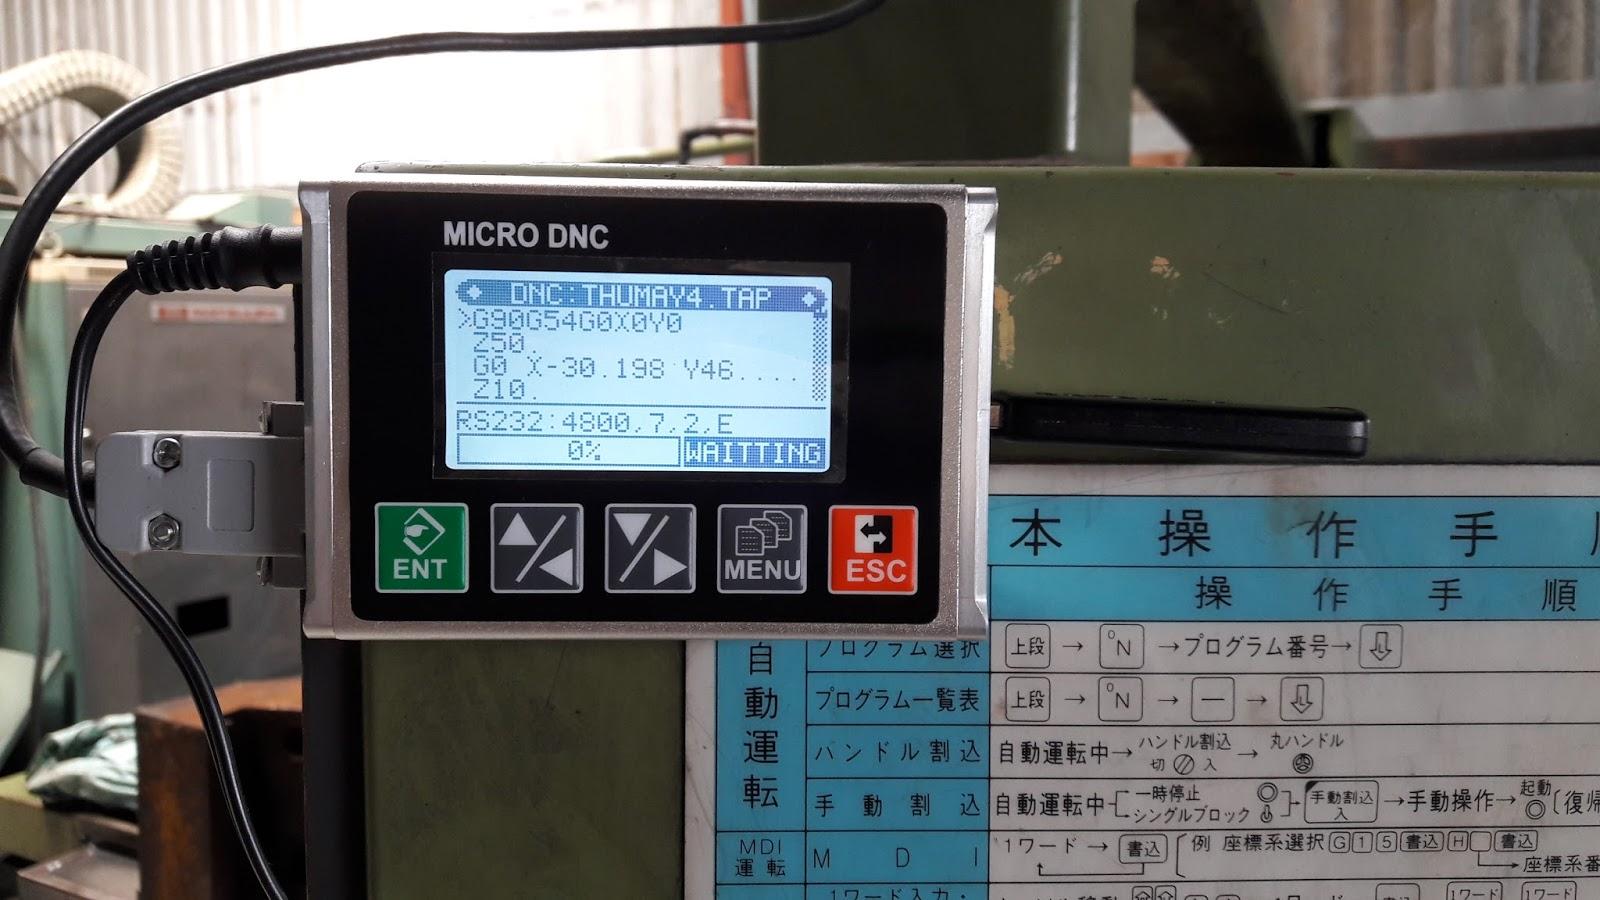 transfer file to machine